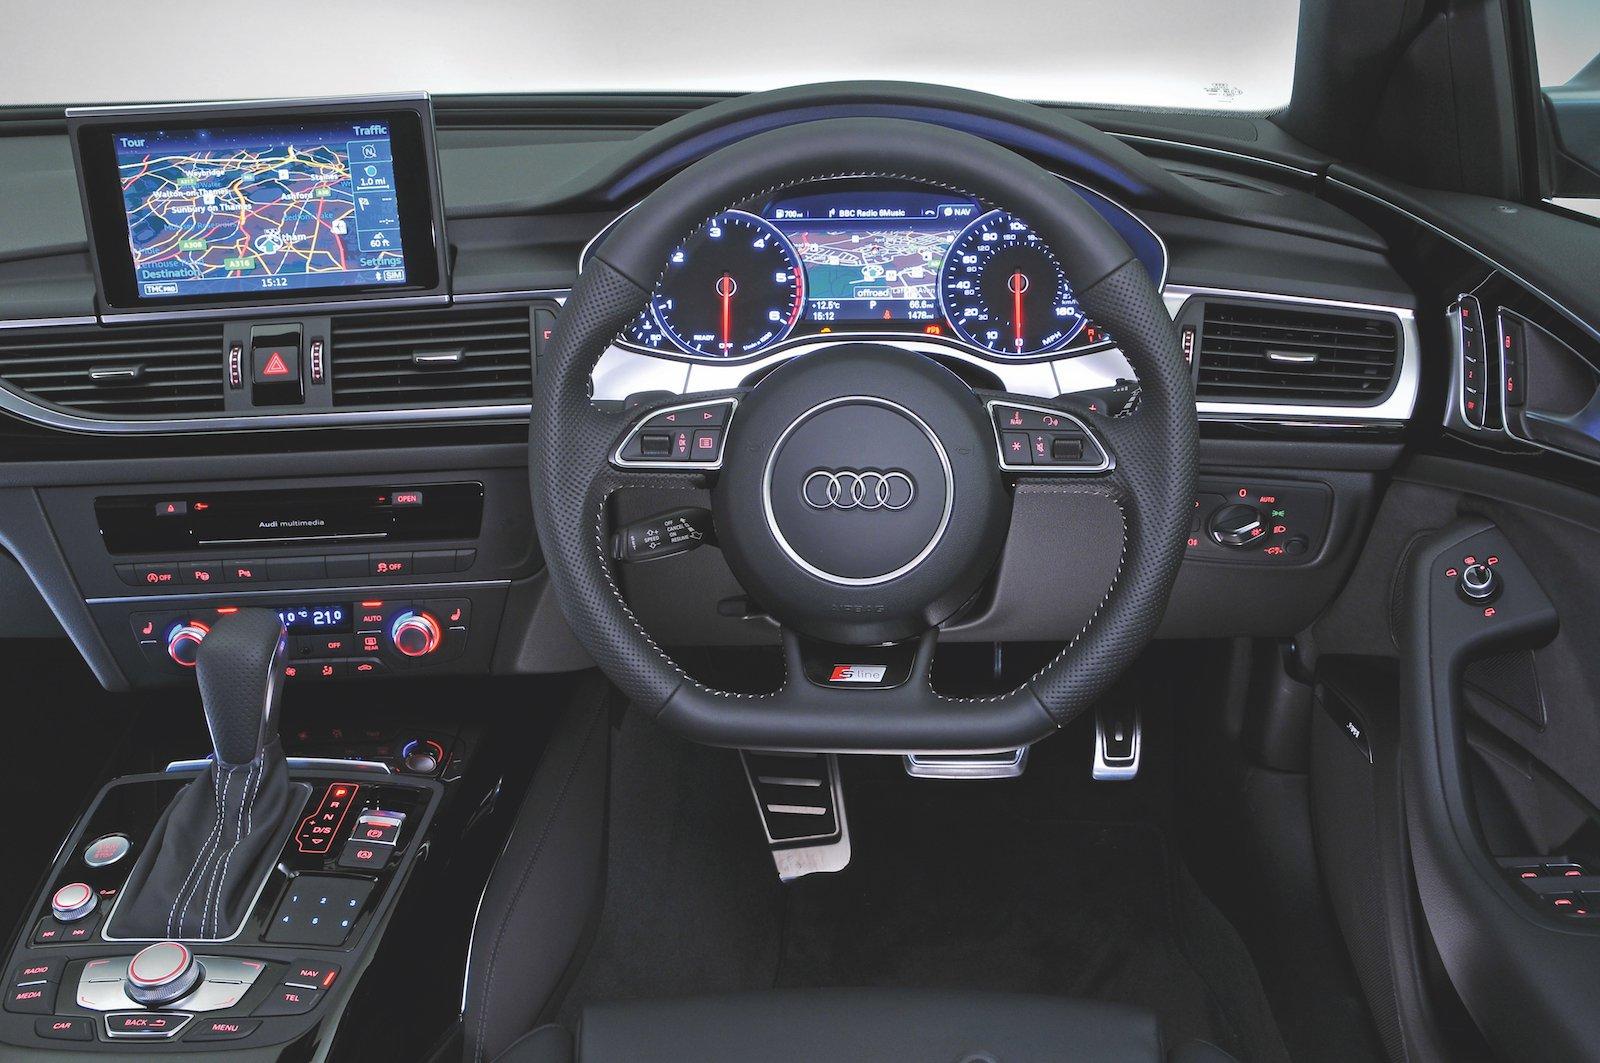 Used Audi A6 Avant 2011-2018